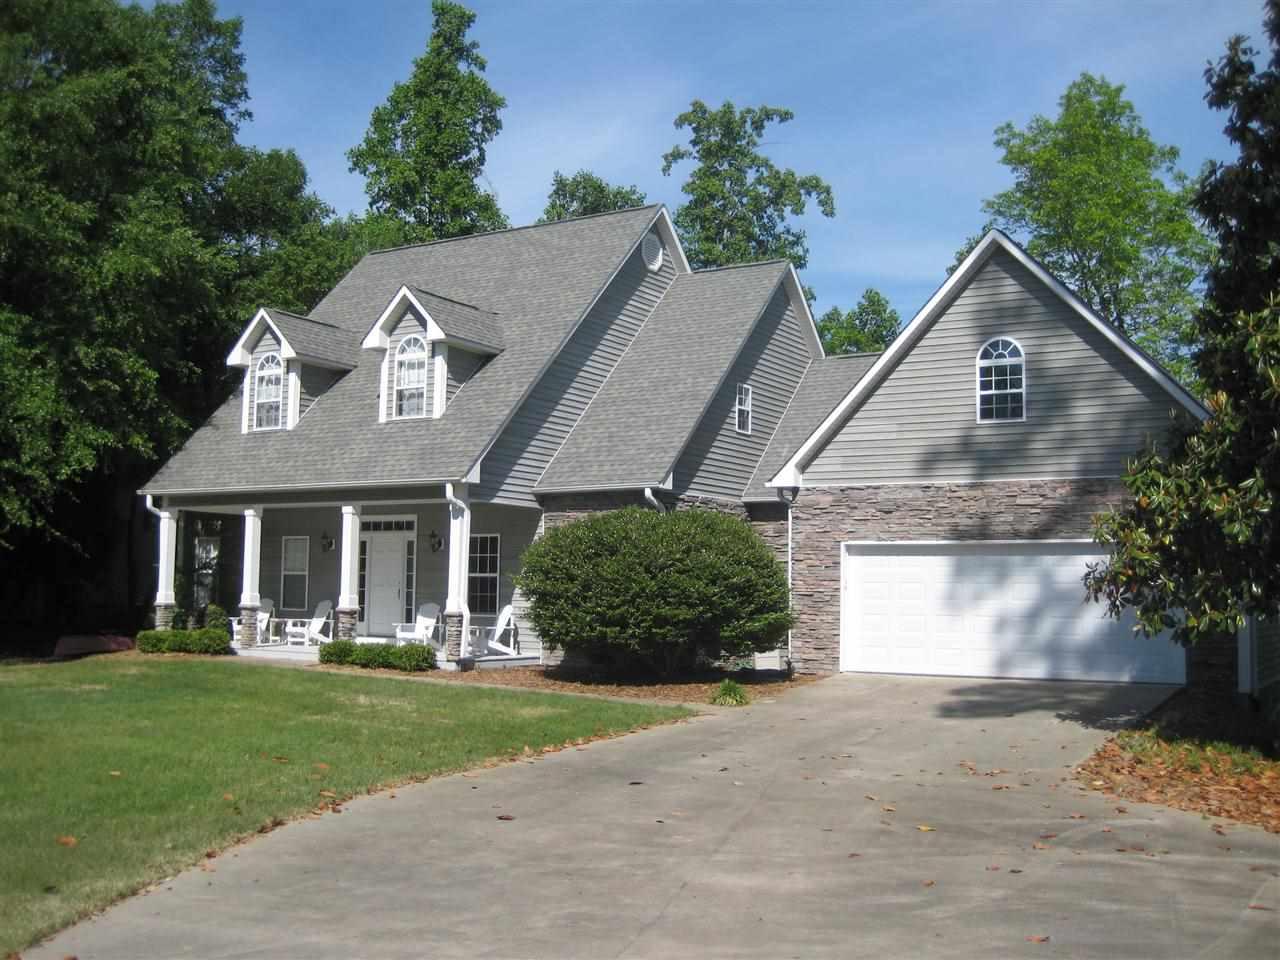 Real Estate for Sale, ListingId: 31611384, Seneca,SC29672